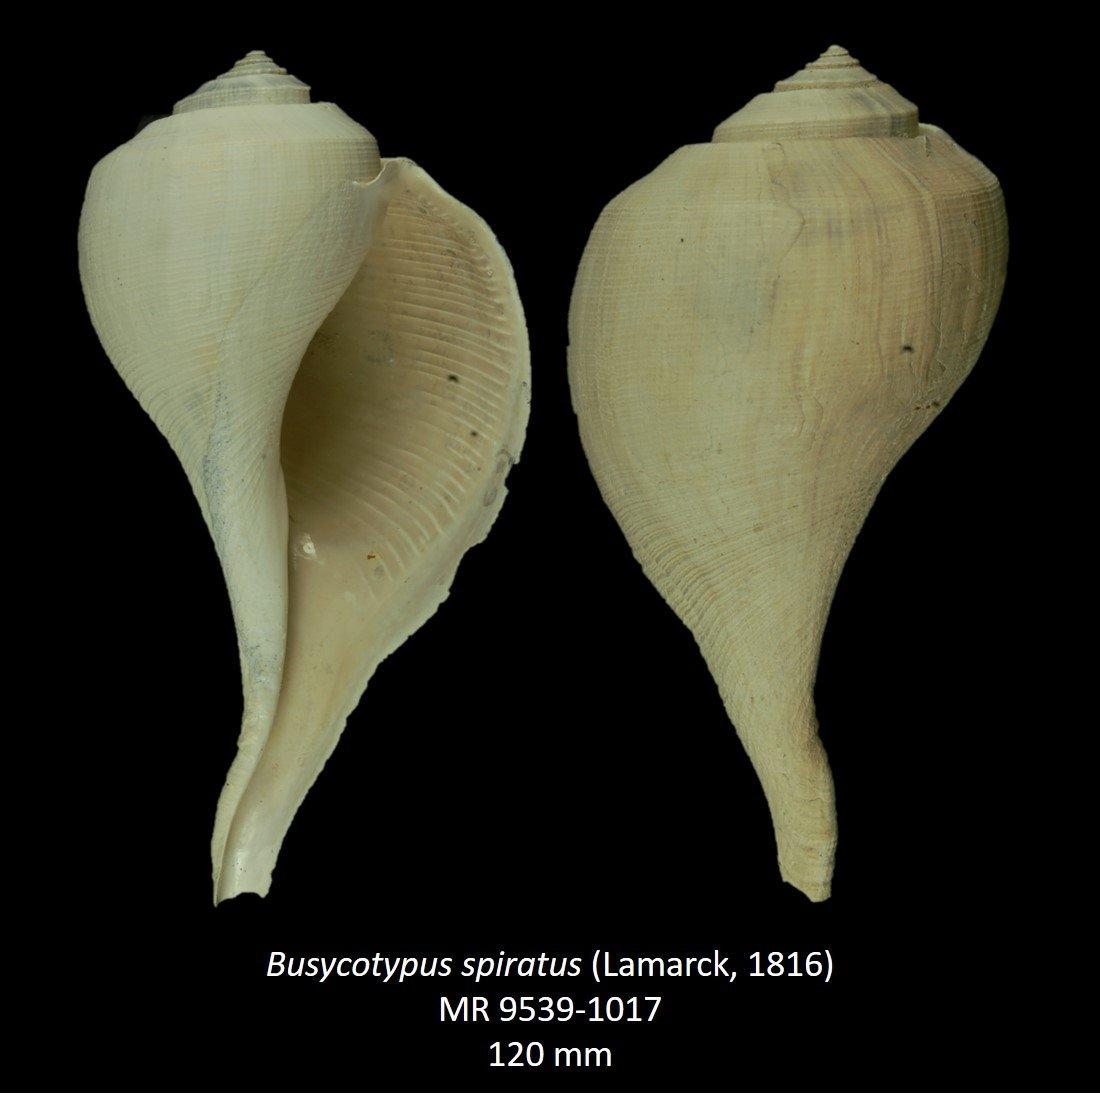 Busycotypus spiratus